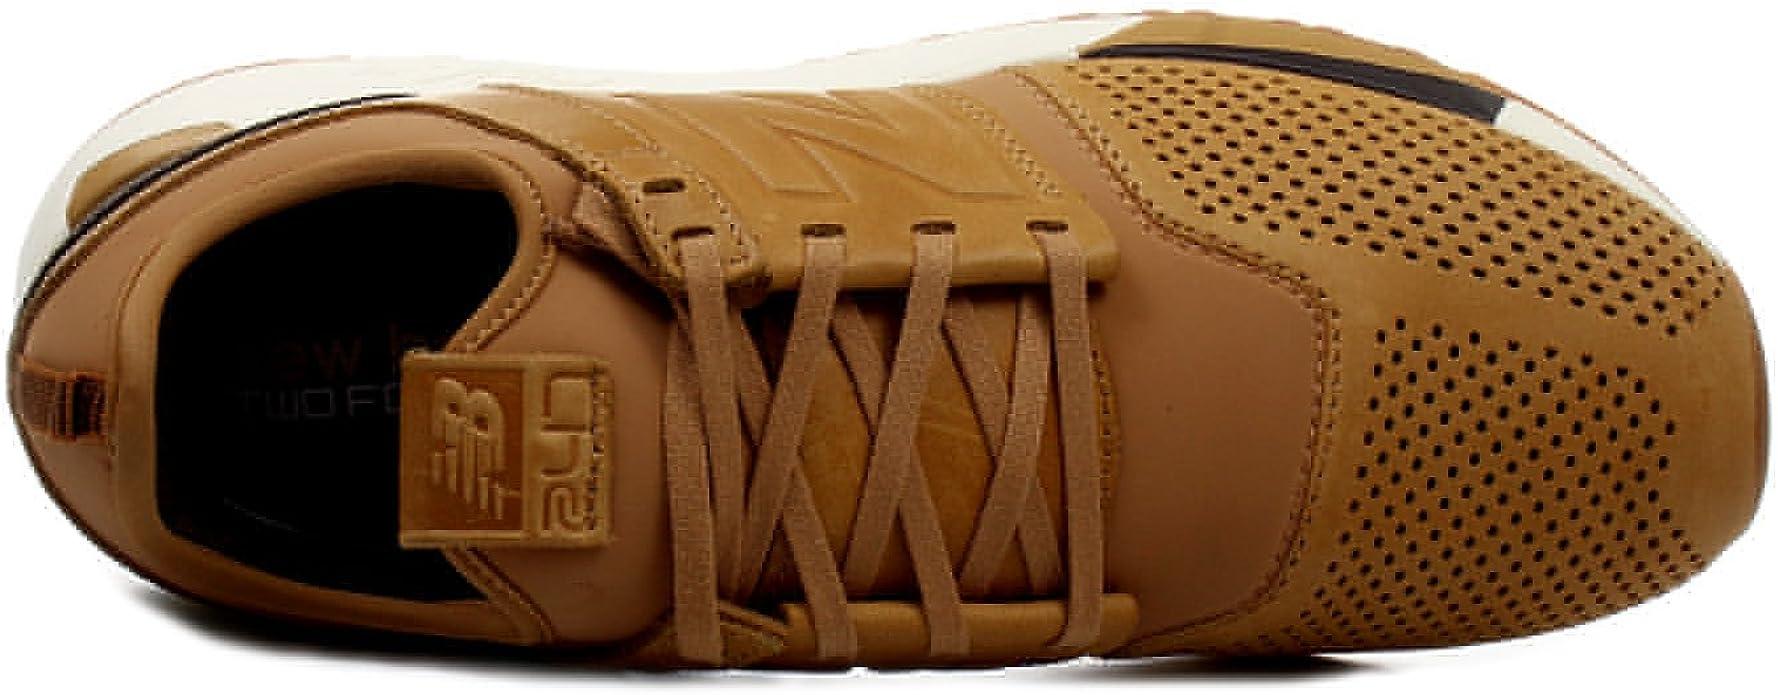 New Balance Men's 247 Luxe Classic Brown Mrl247ta